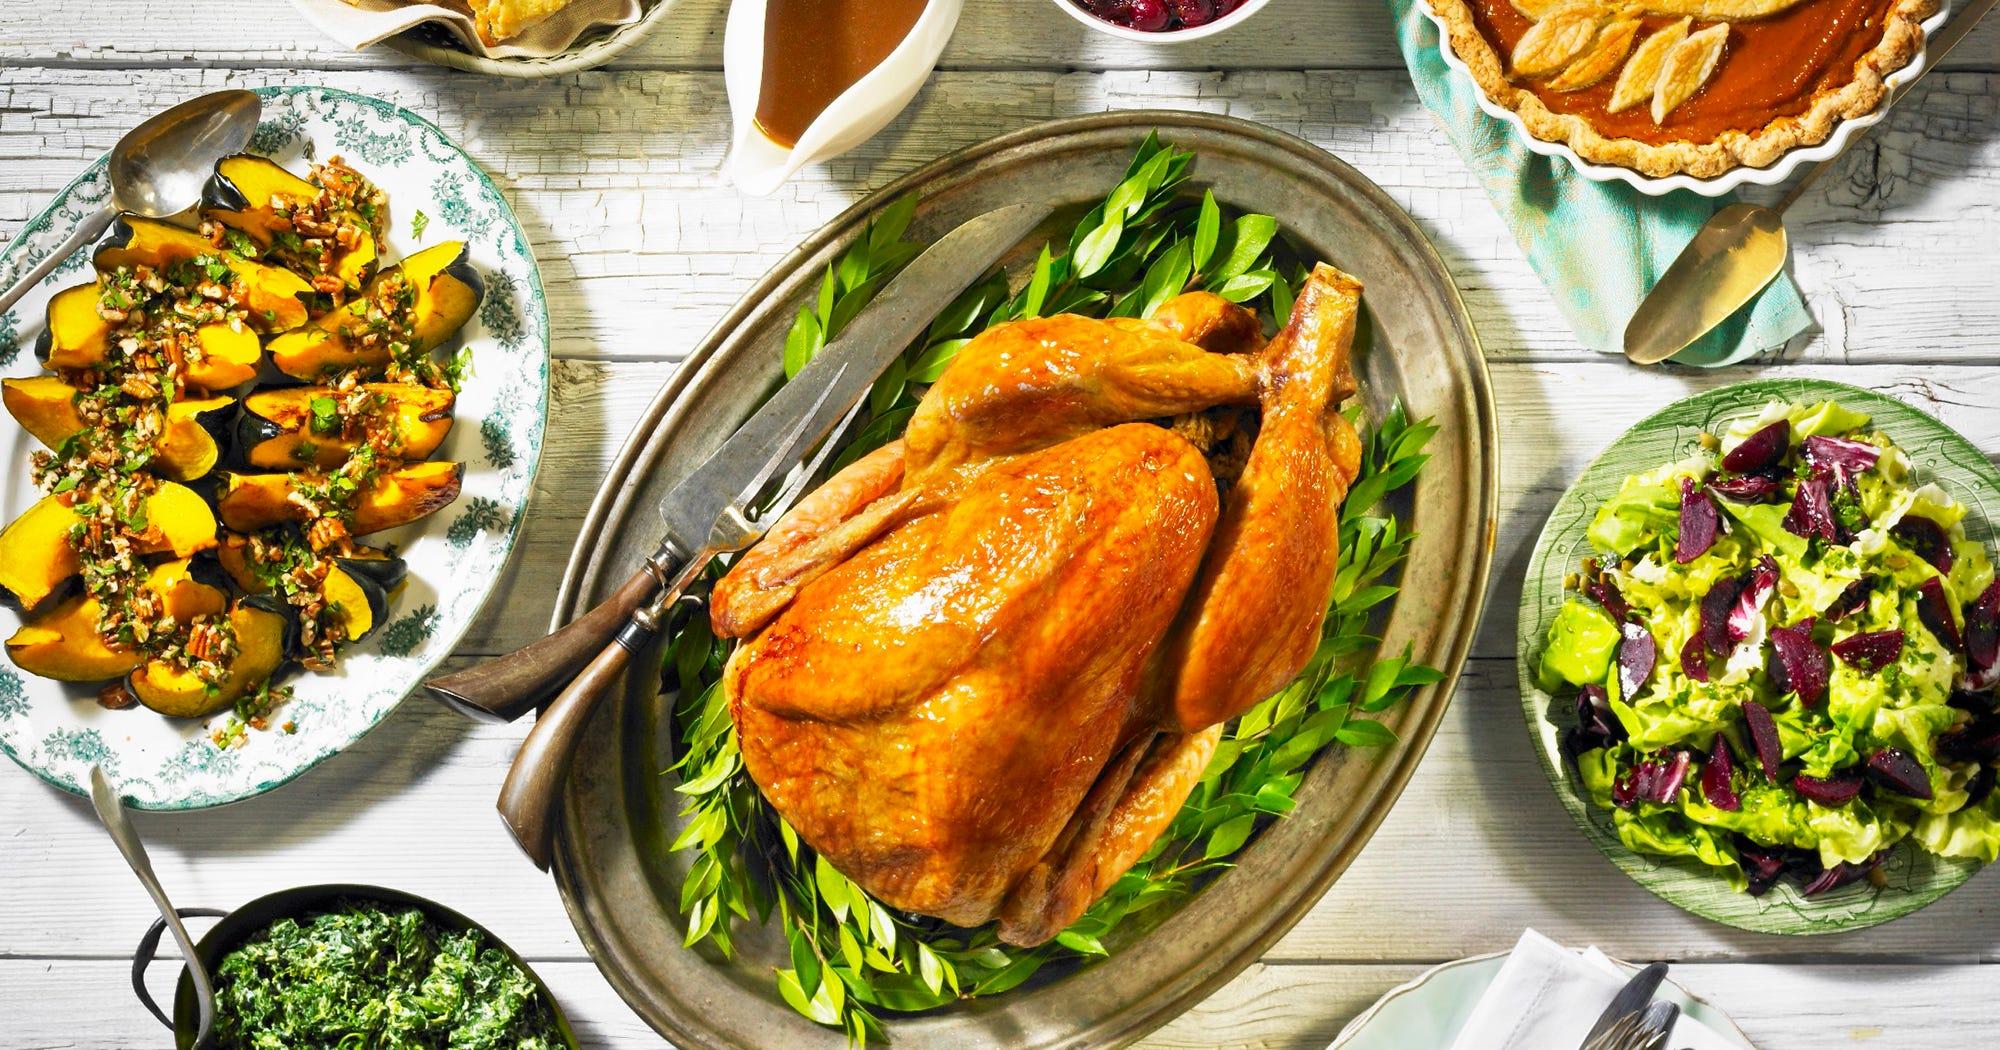 Best restaurants open on christmas holiday dinner 2017 for Restaurants open for christmas dinner